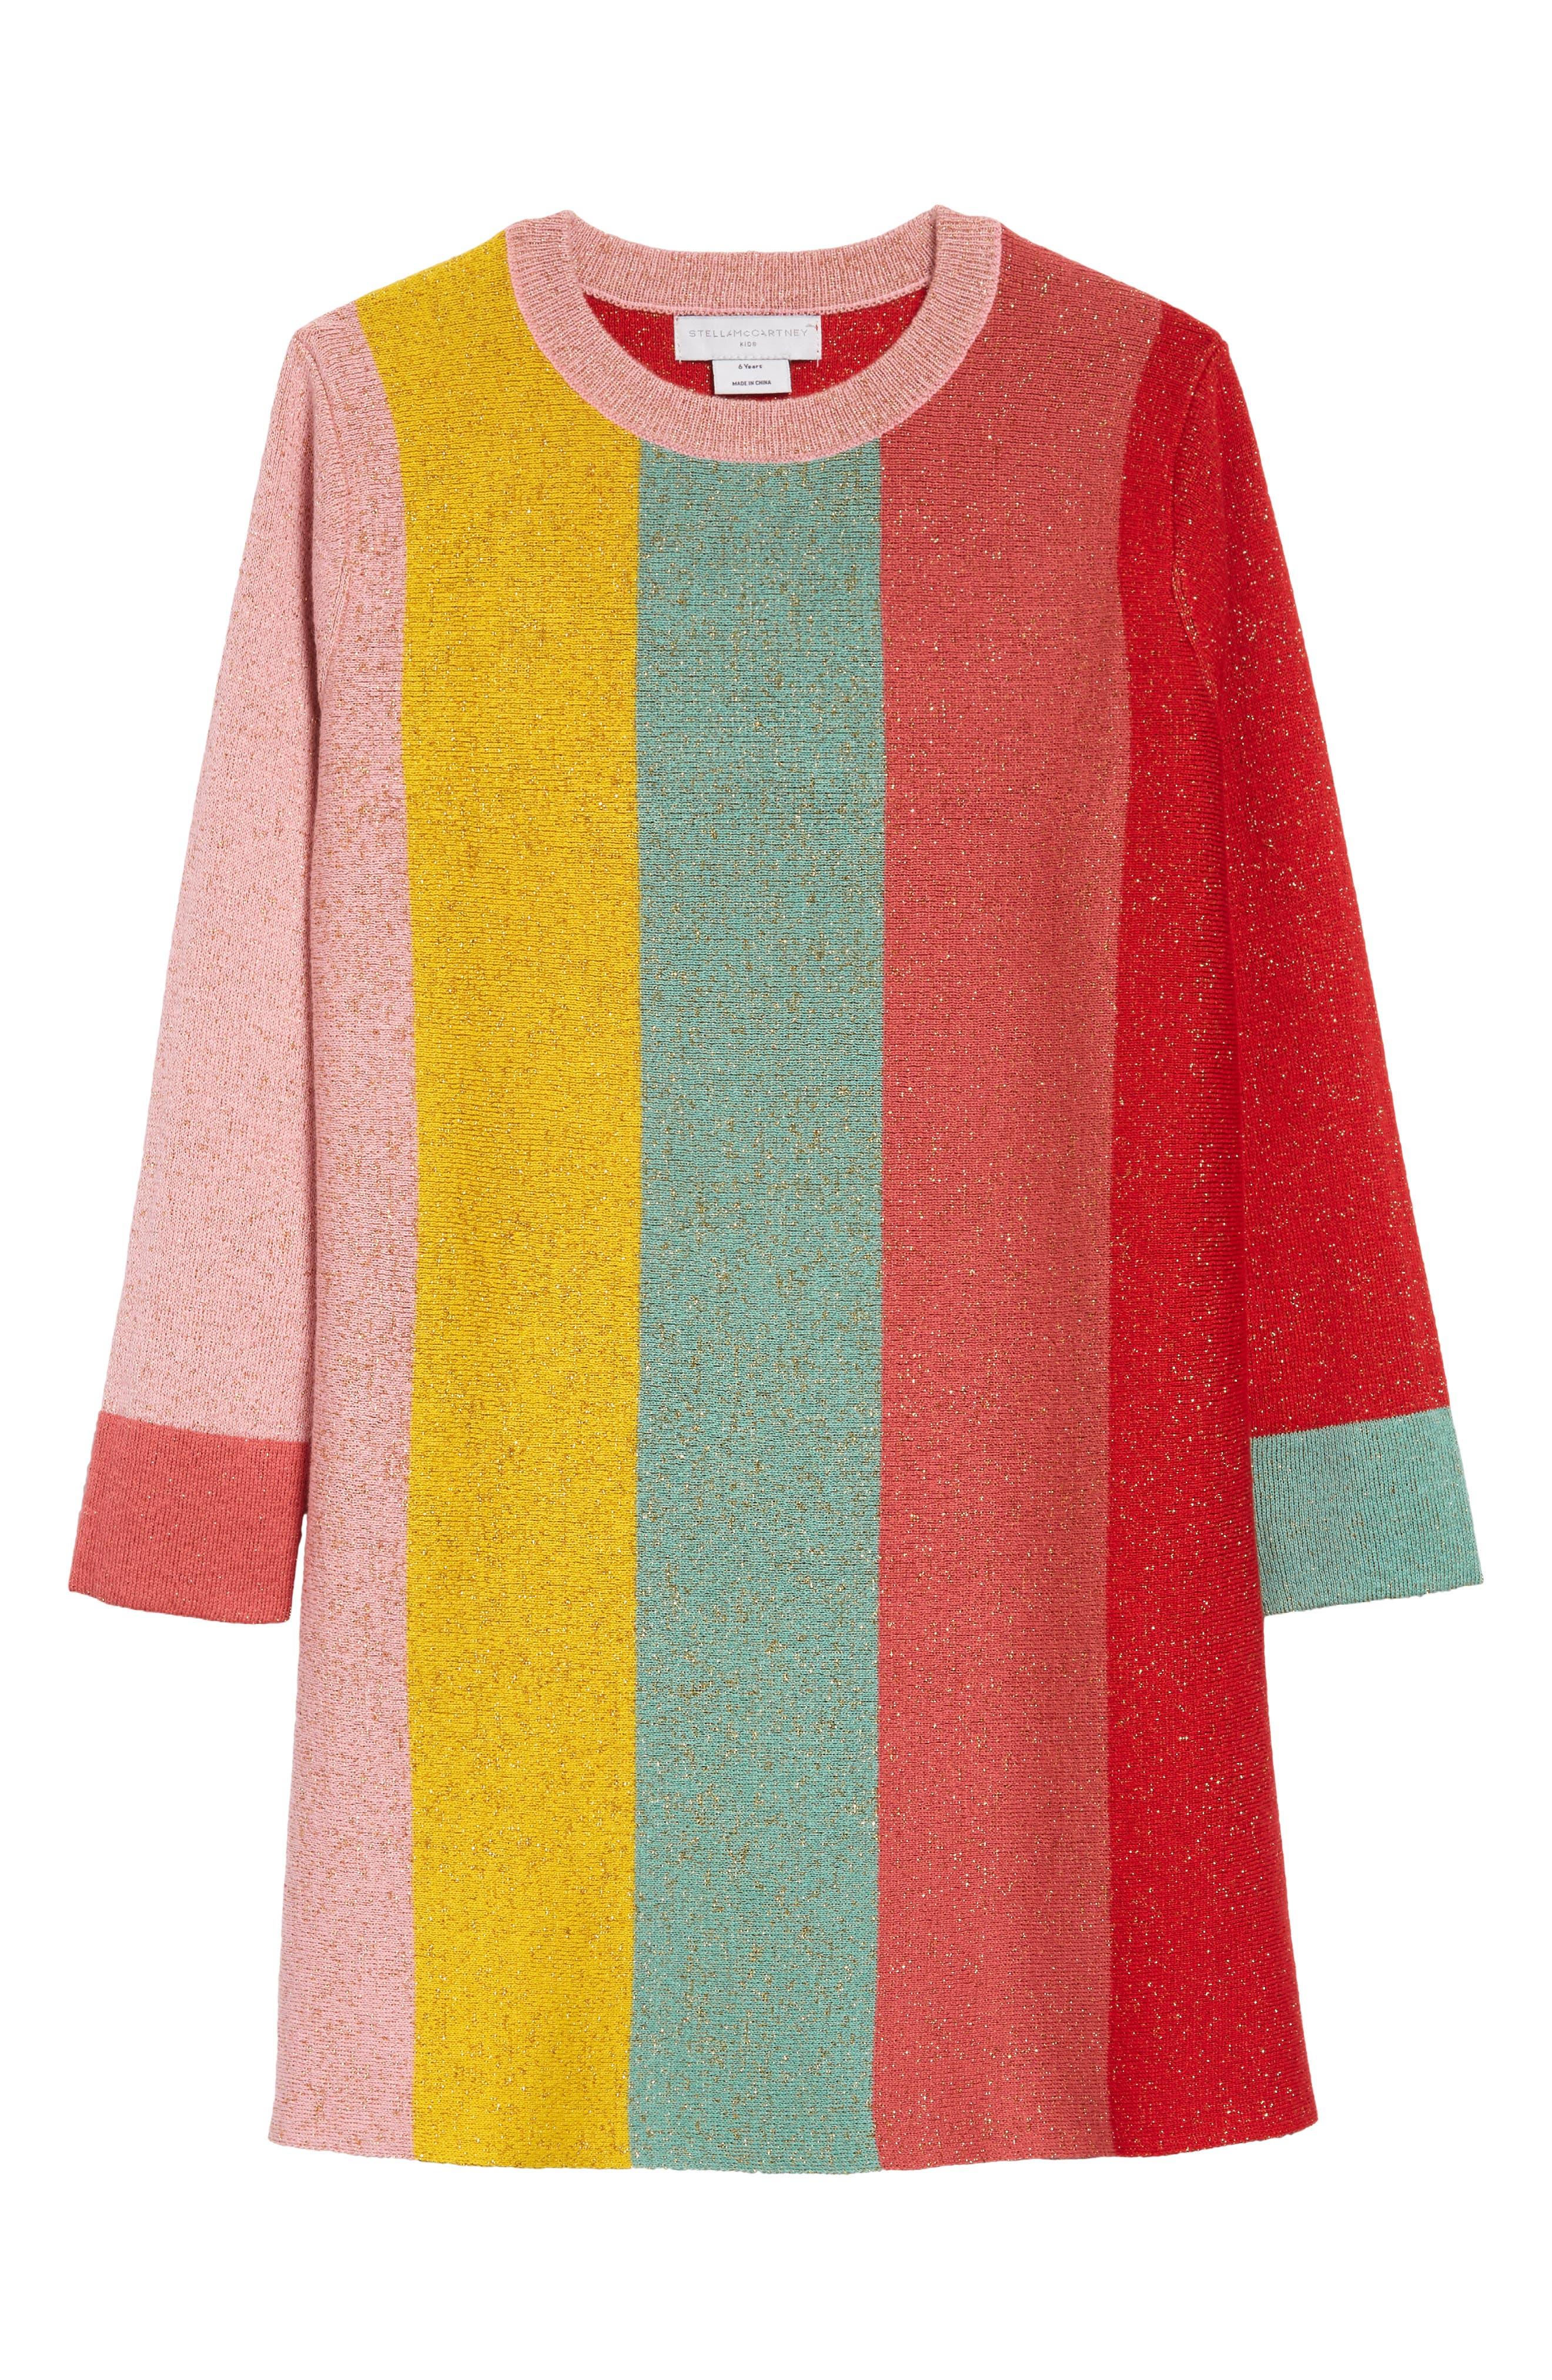 60s 70s Kids Costumes & Clothing Girls & Boys Girls Stella Mccartney Colorblock Metallic Stripe Shift Dress $88.20 AT vintagedancer.com